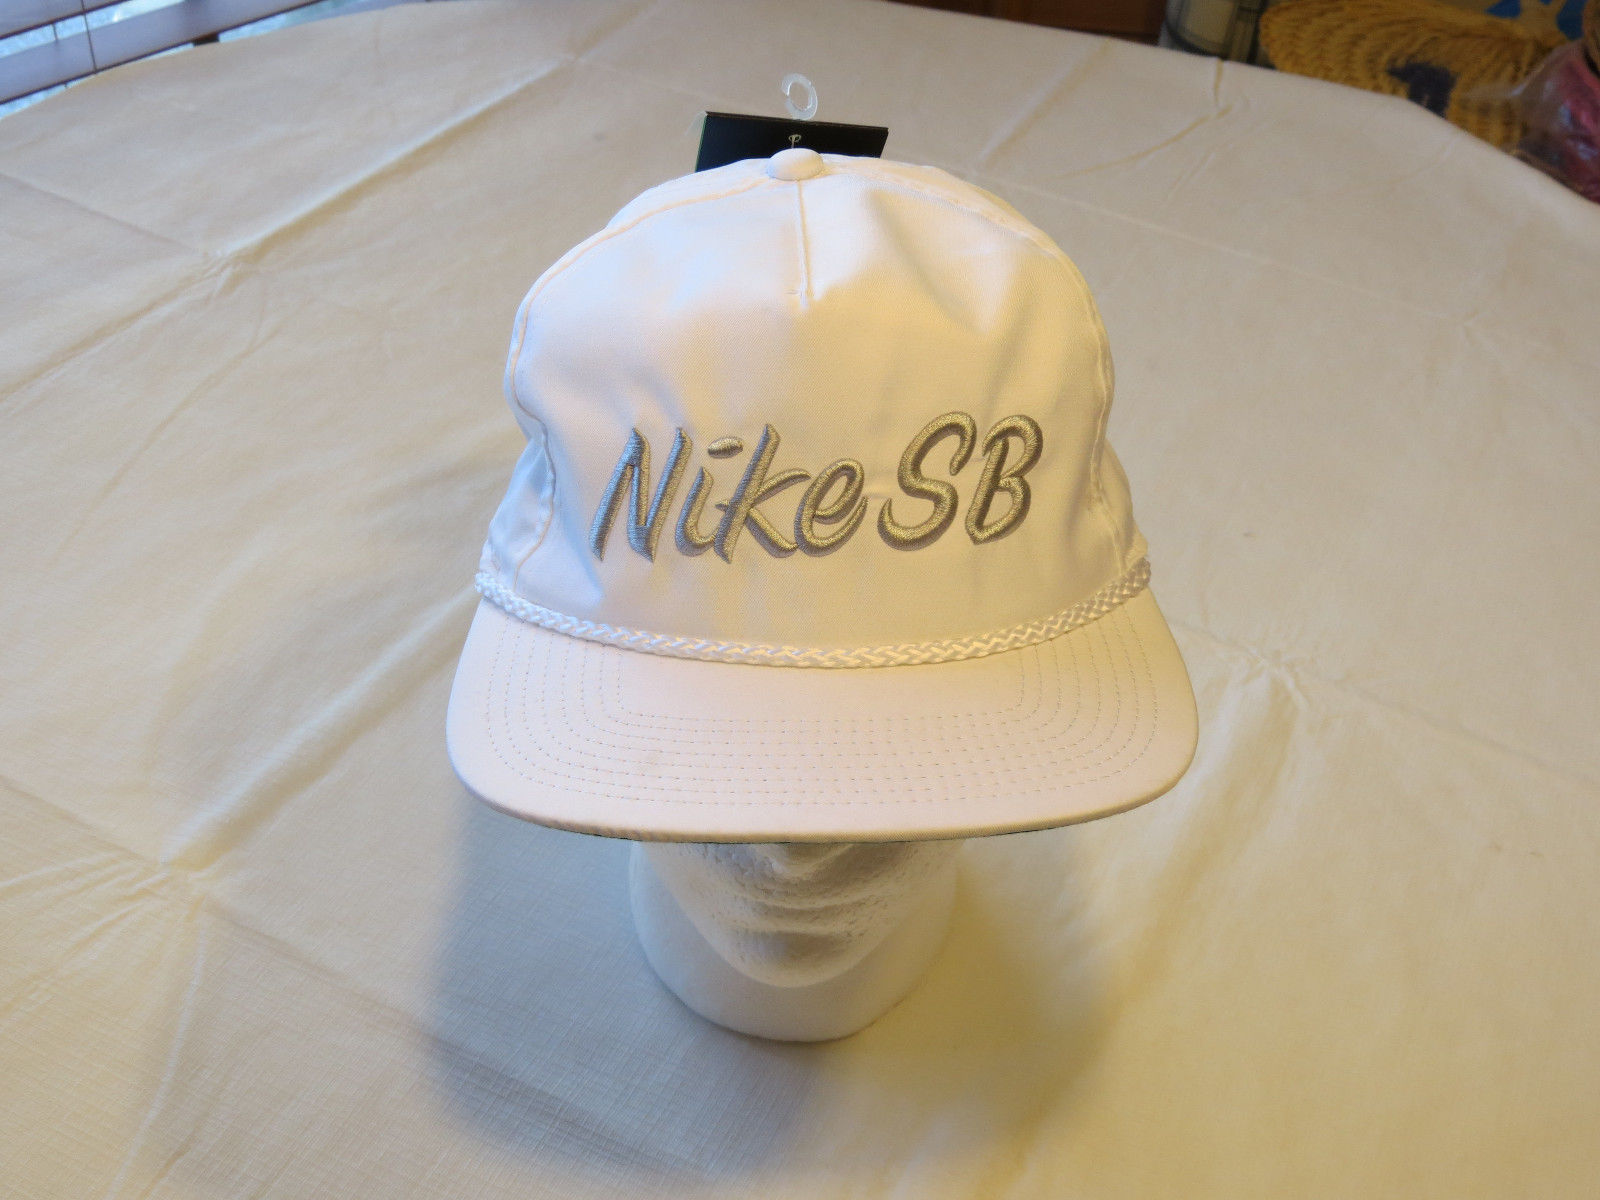 bd8dc71ca Nike SB hat cap RARE skateboarding 778343 and 50 similar items